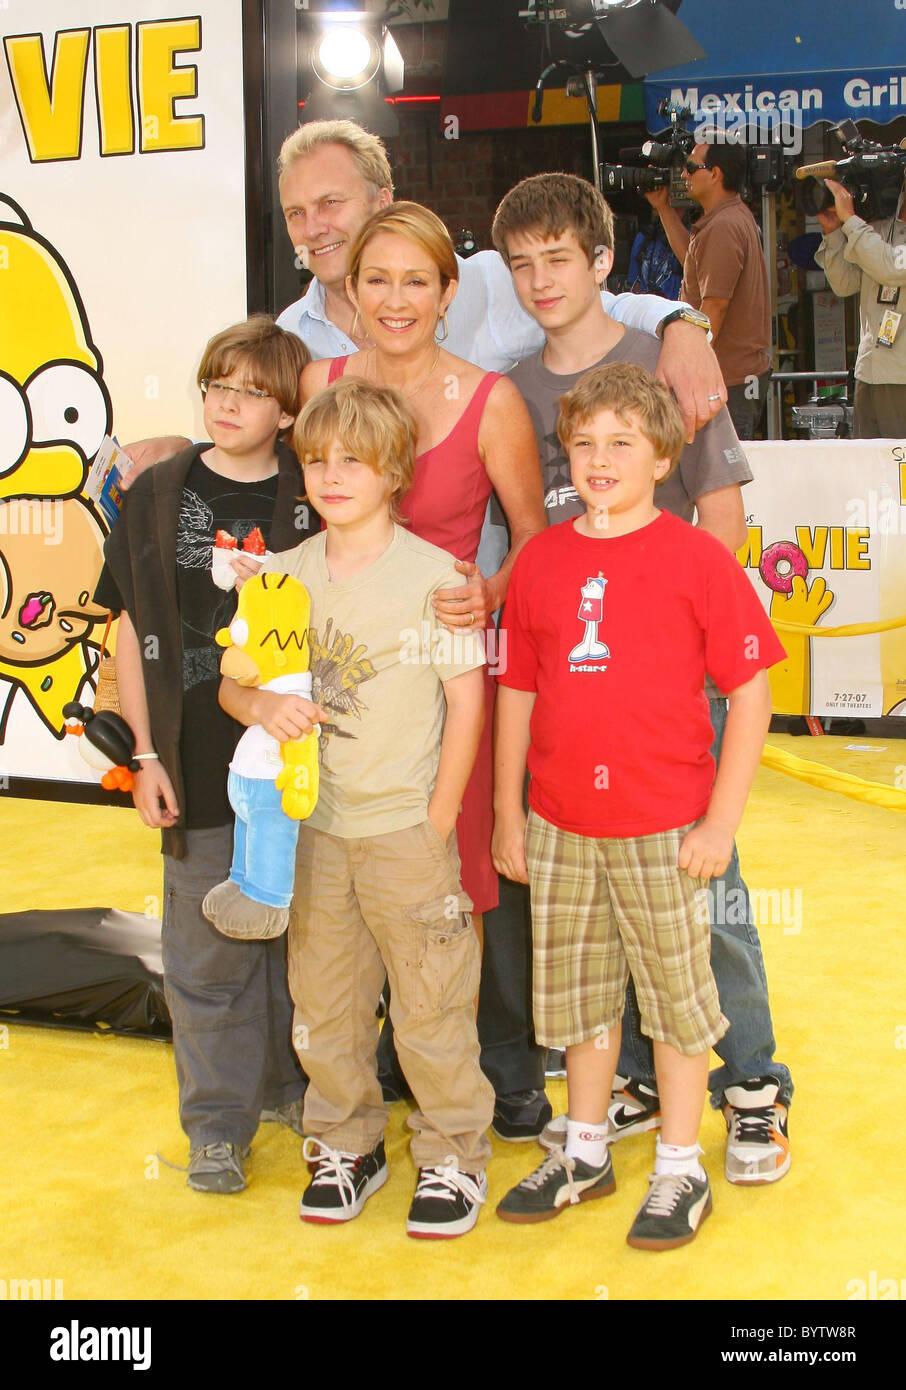 Patricia Heaton And Family The Simpsons Movie World Premiere Stock Photo Alamy